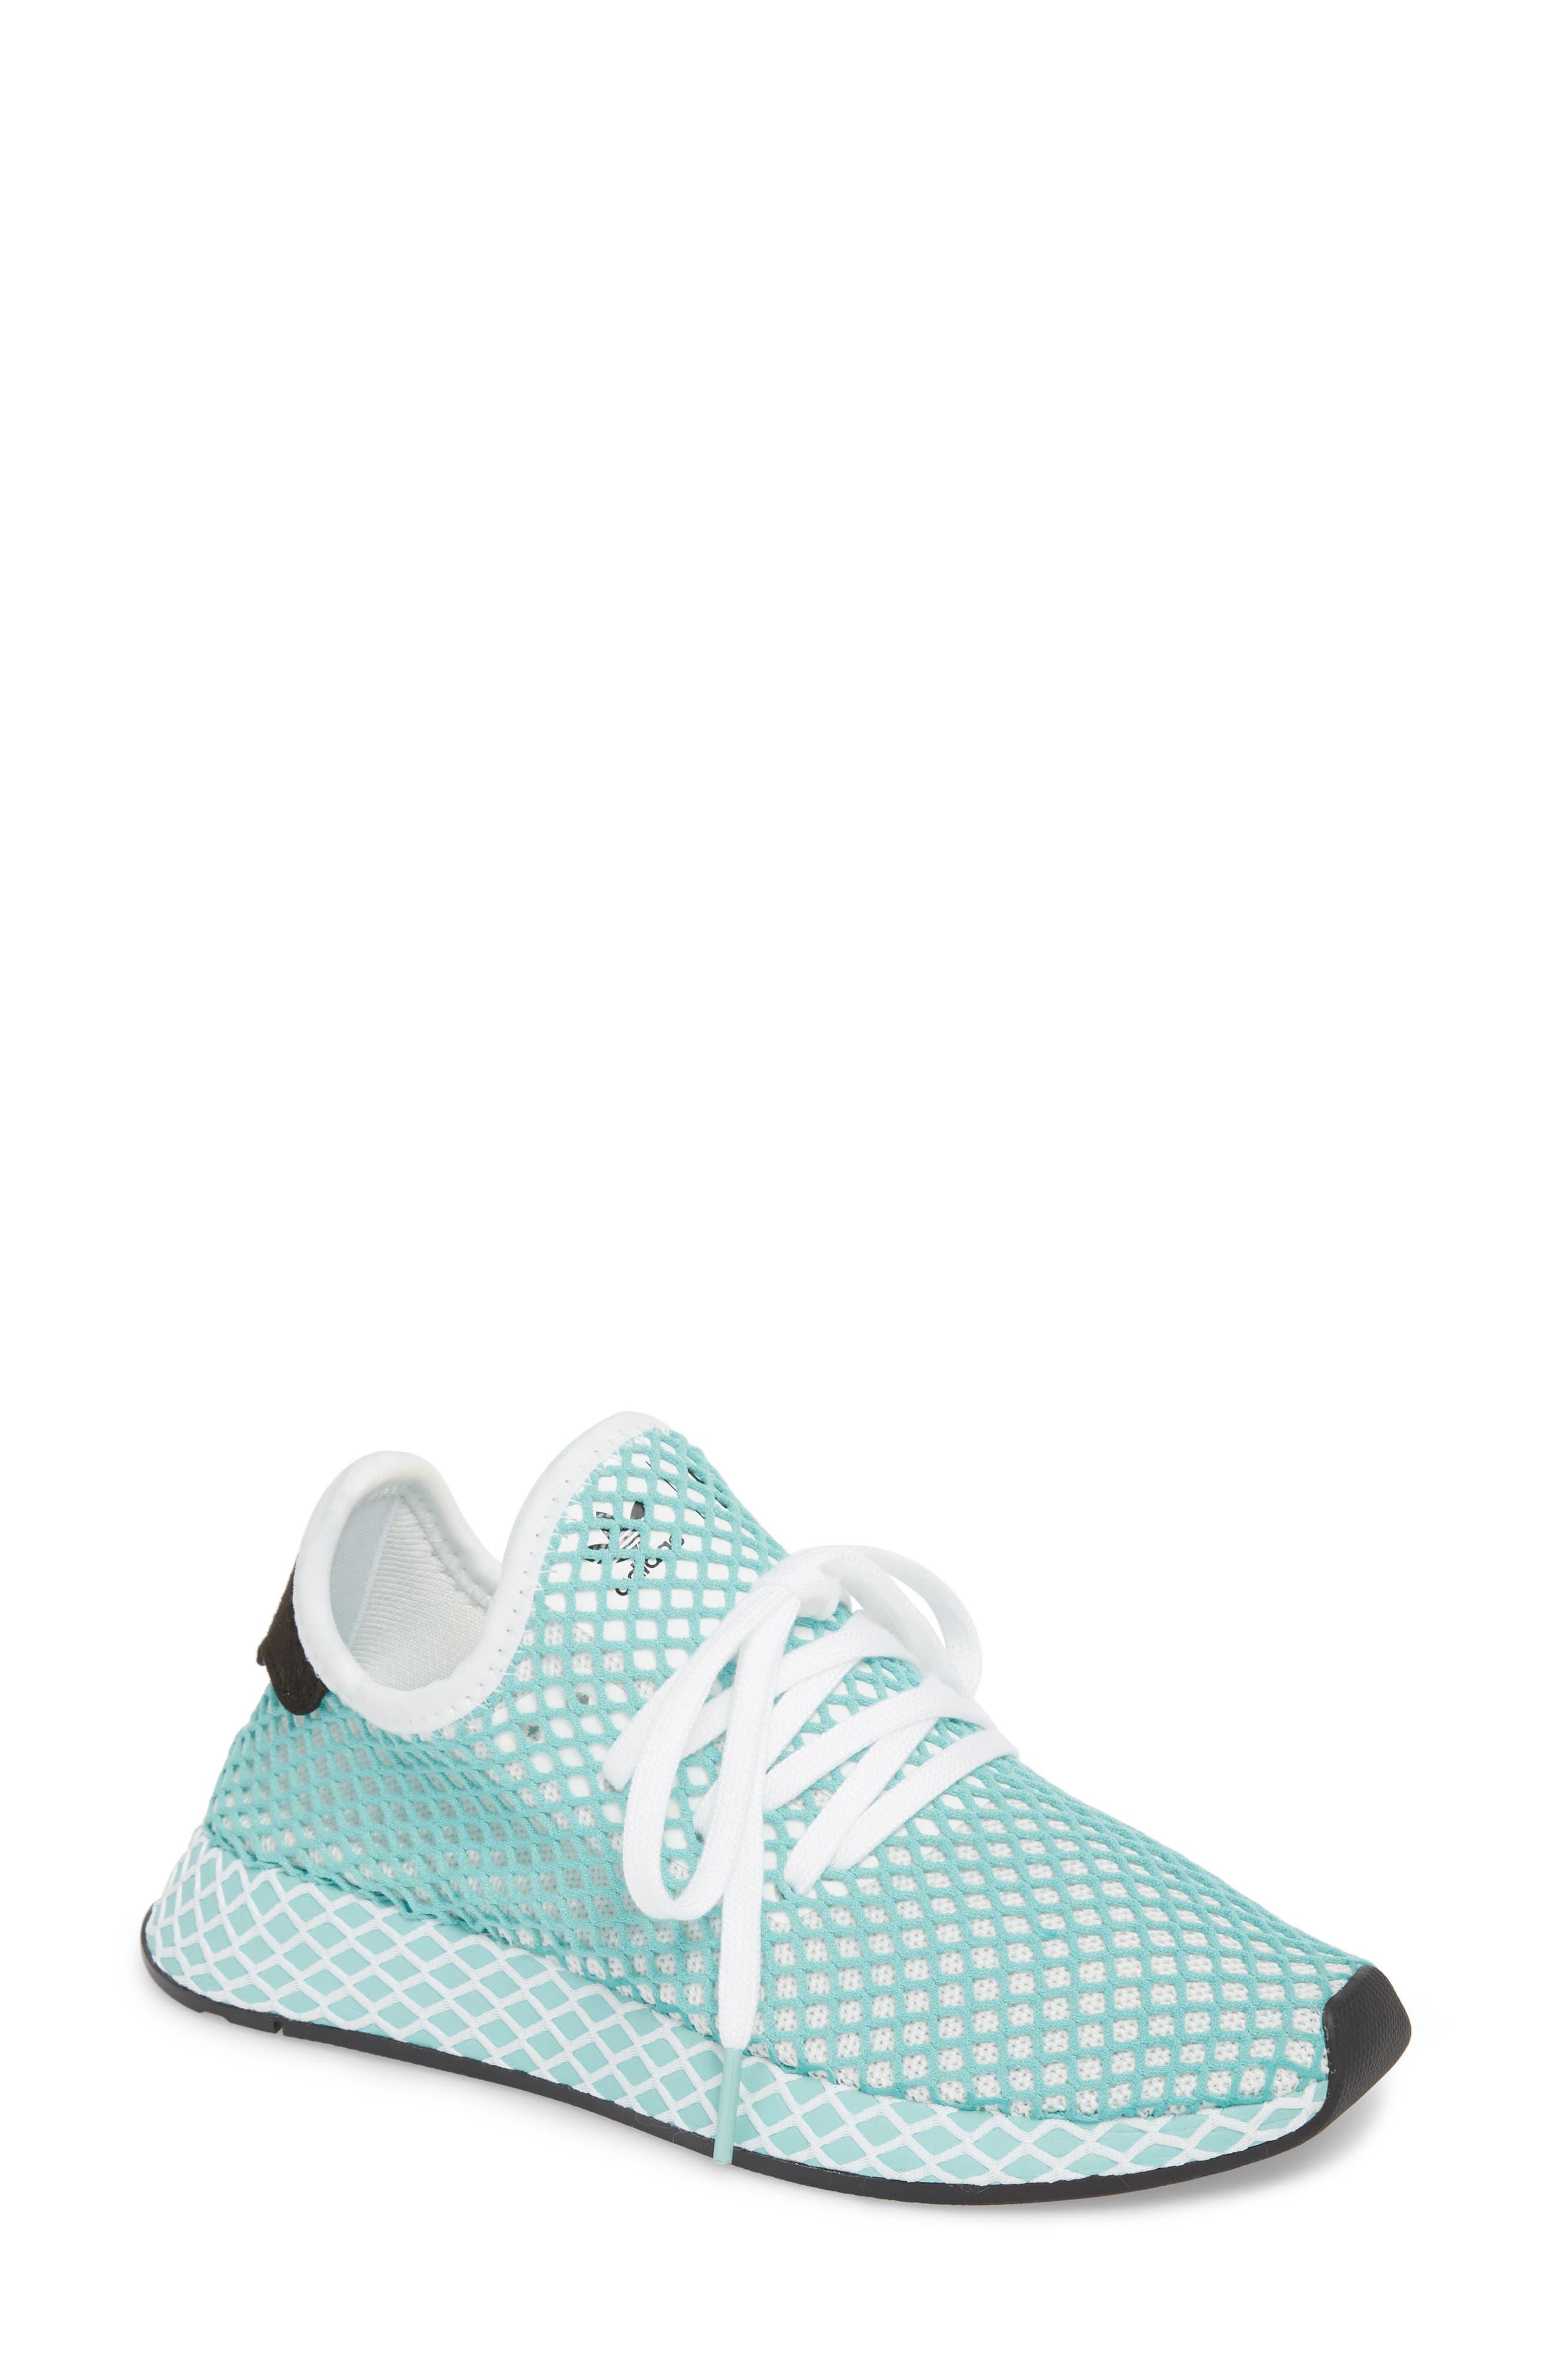 Deerupt x Parley Runner Sneaker,                         Main,                         color,